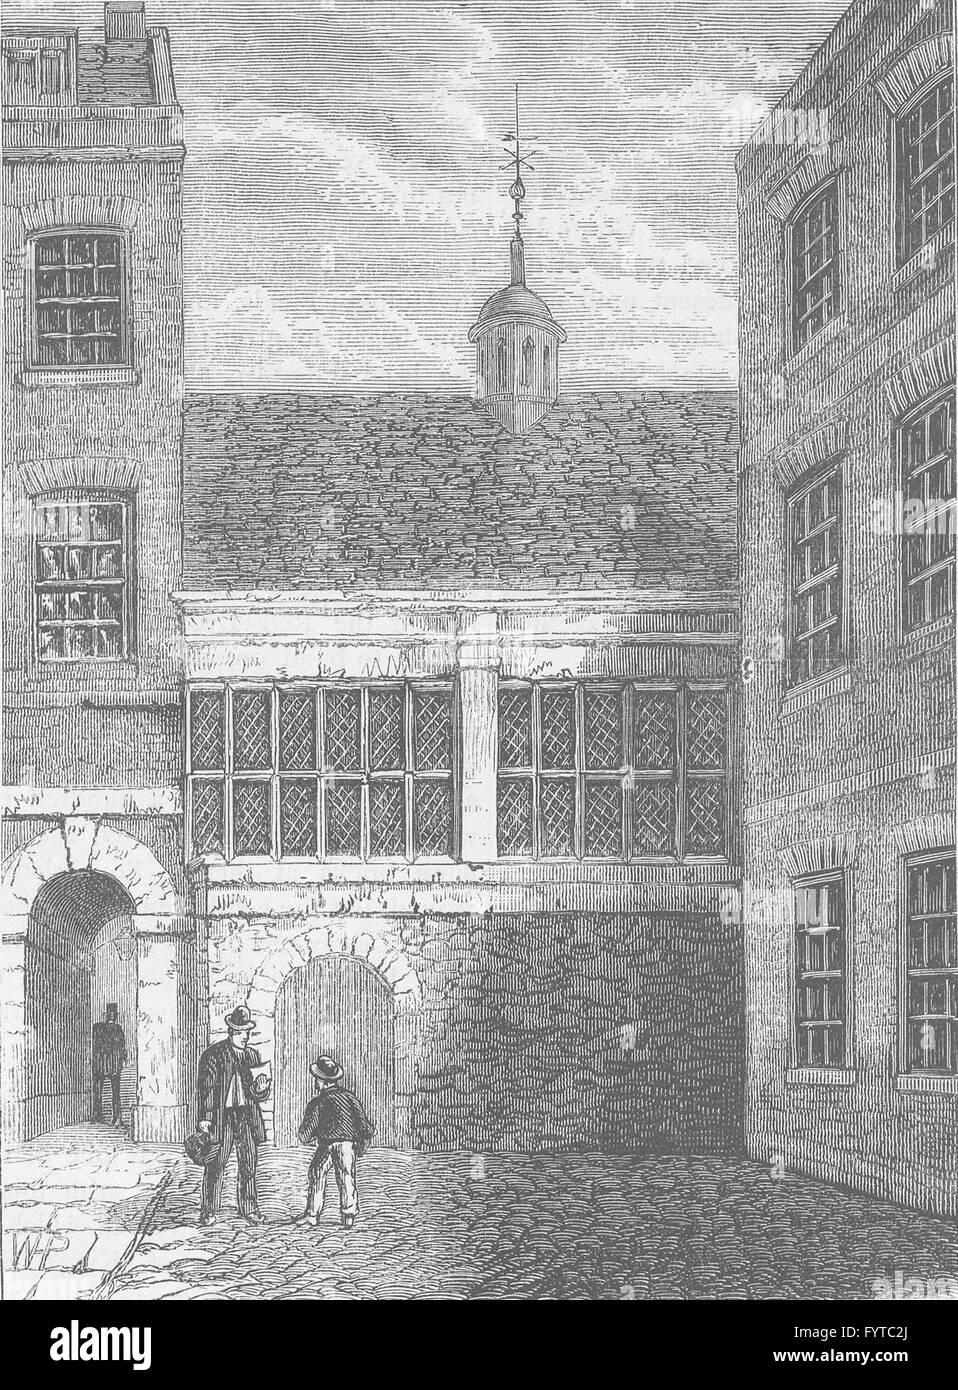 THE HOLBORN INNS OF COURT AND CHANCERY: Barnard's Inn. London, old print c1880 - Stock Image